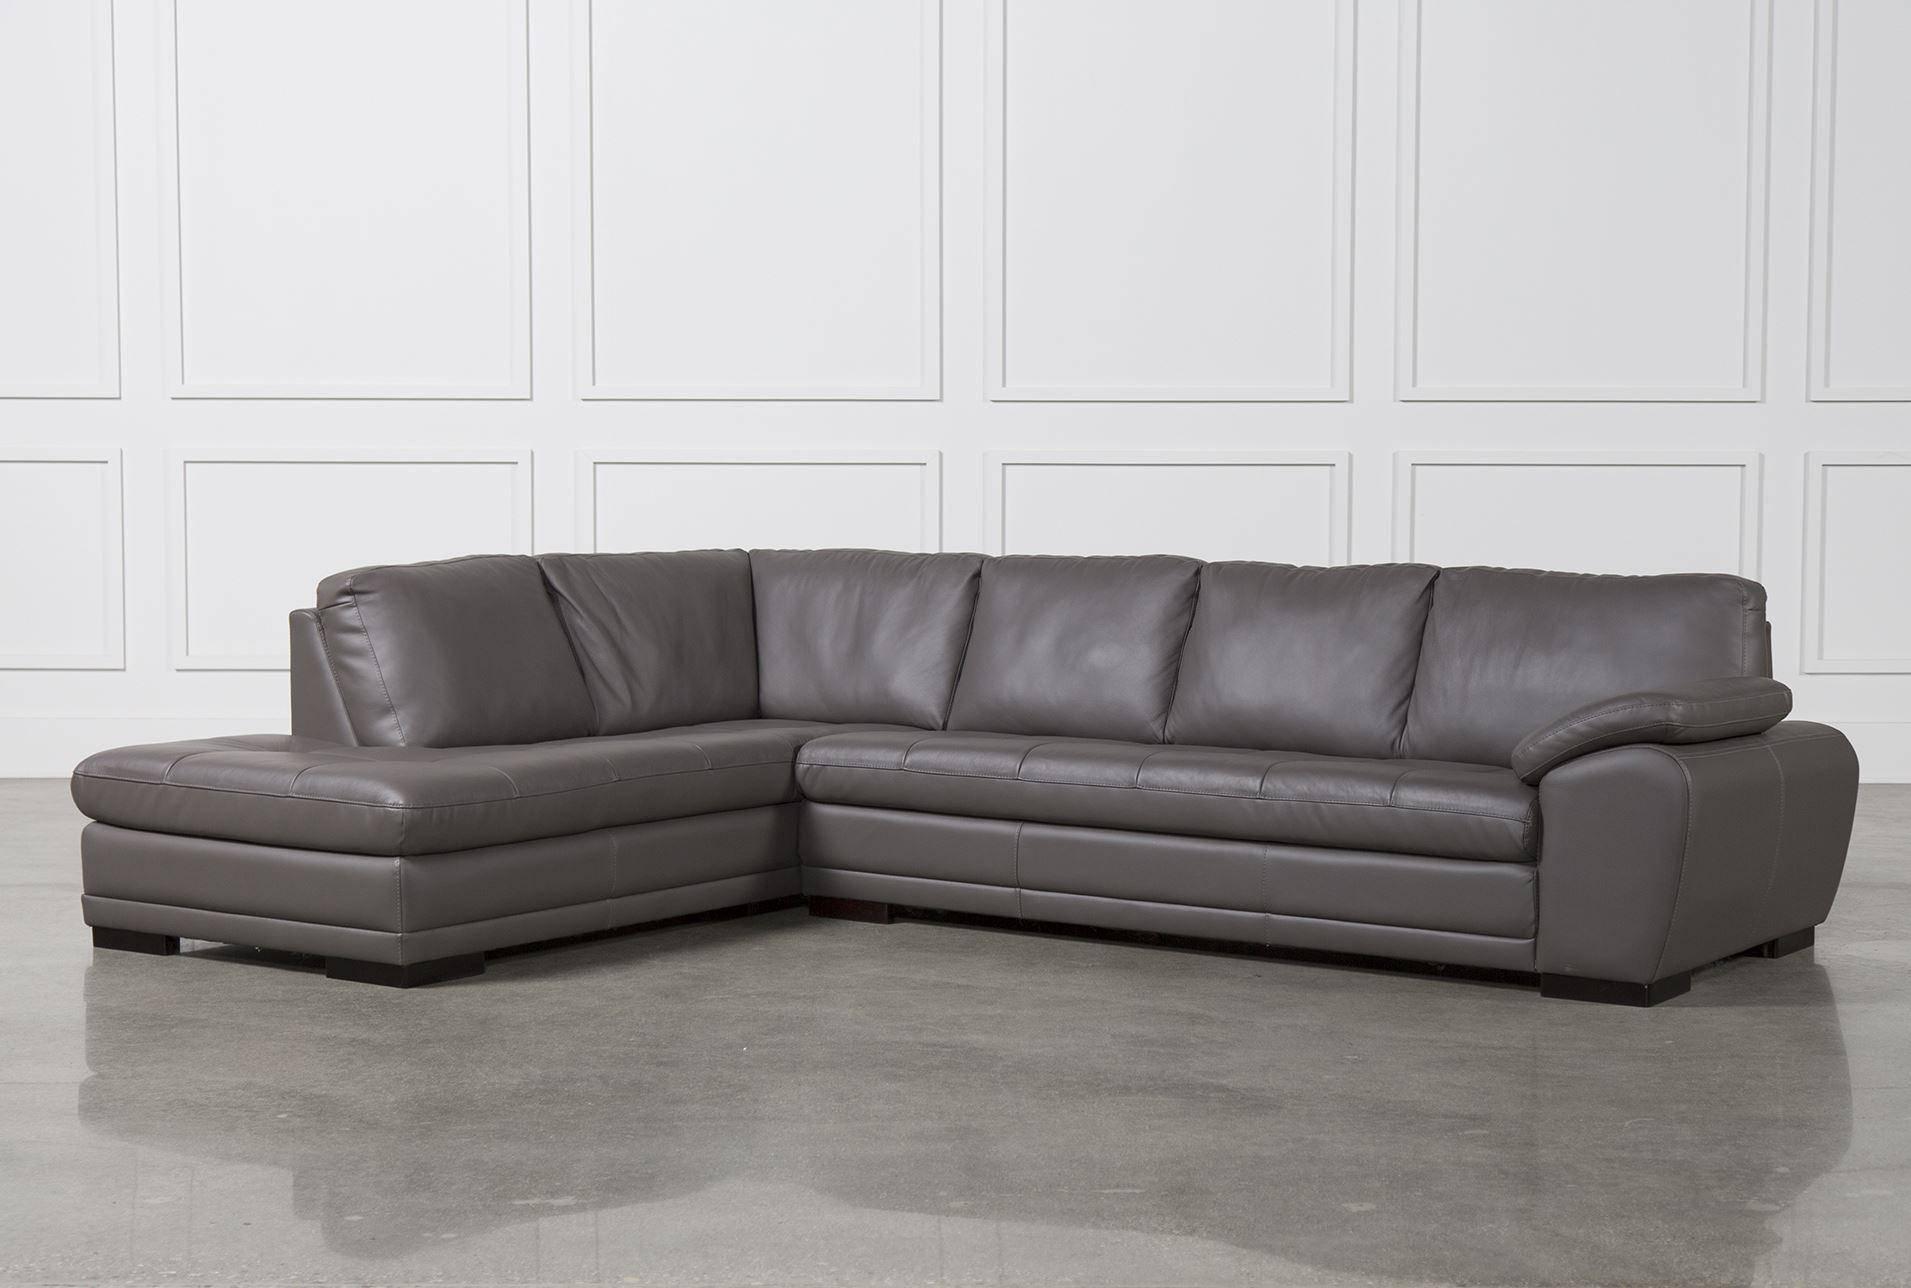 Craigslist Sectional Sofa Centerfieldbar Com : craigslist sectional sofa - Sectionals, Sofas & Couches